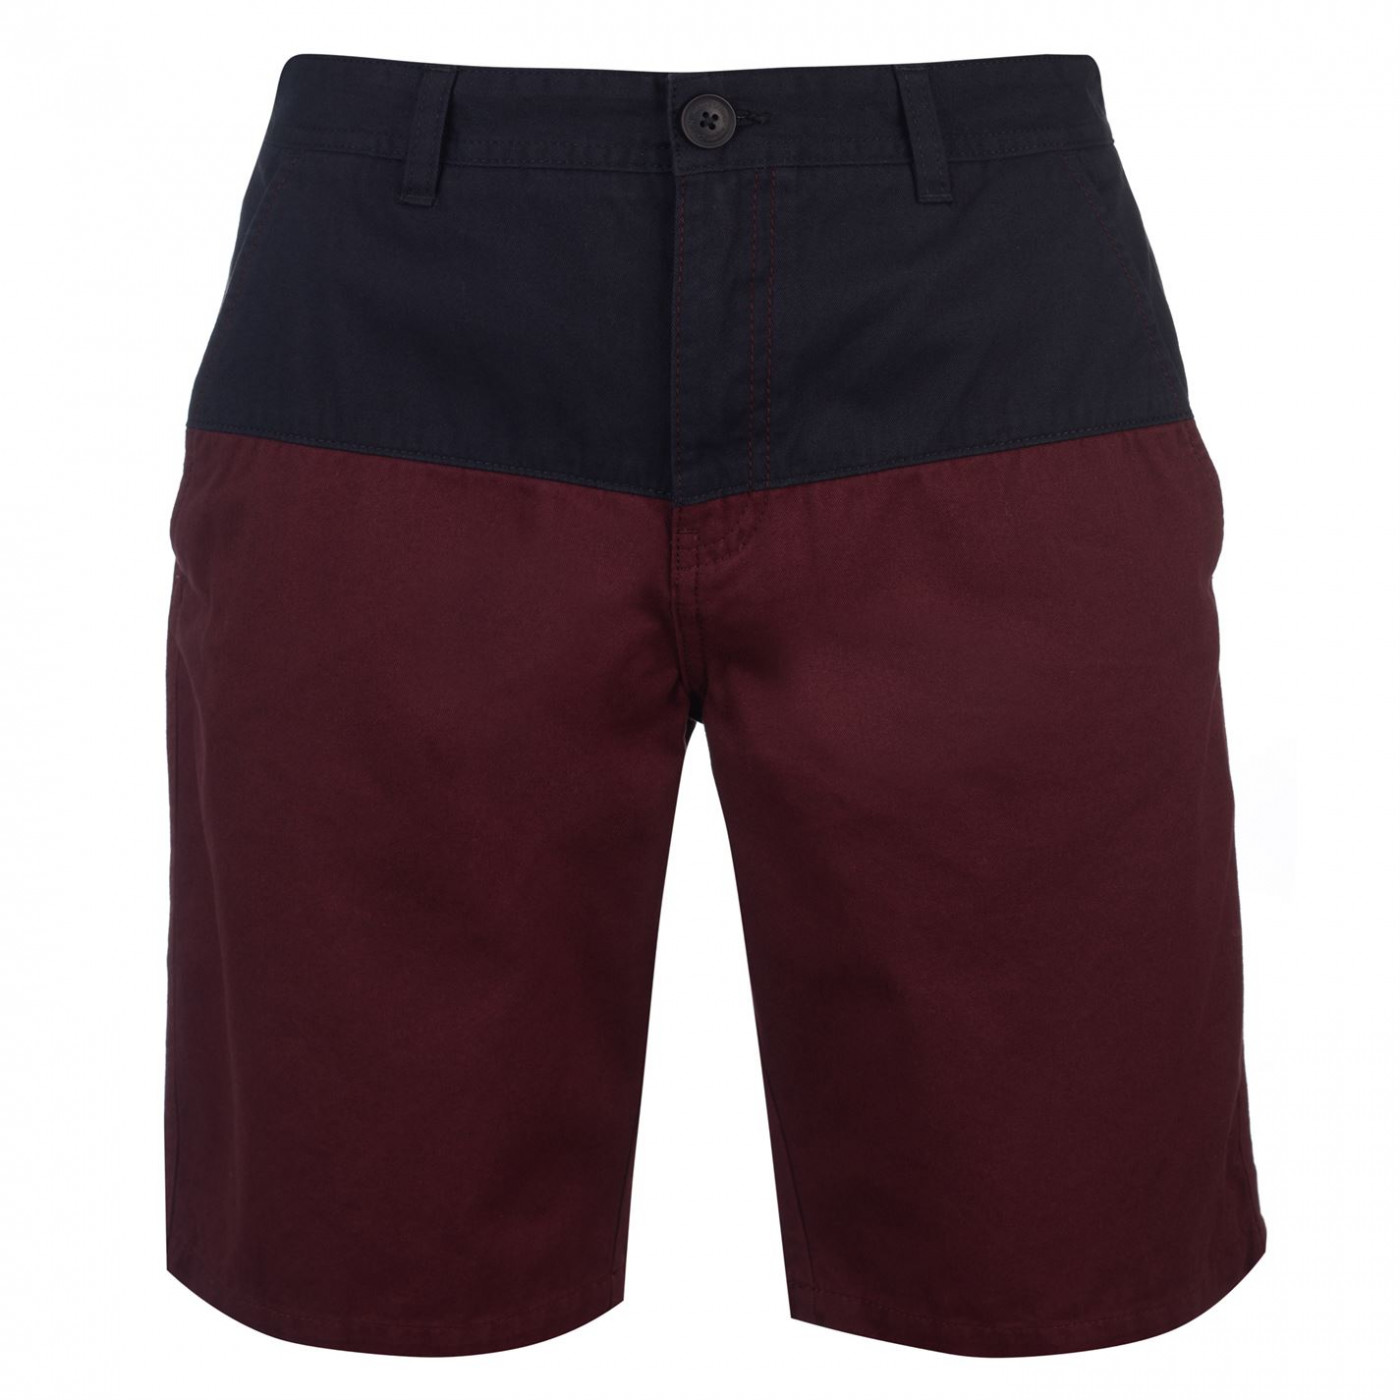 Pierre Cardin Panel Chino Shorts Mens